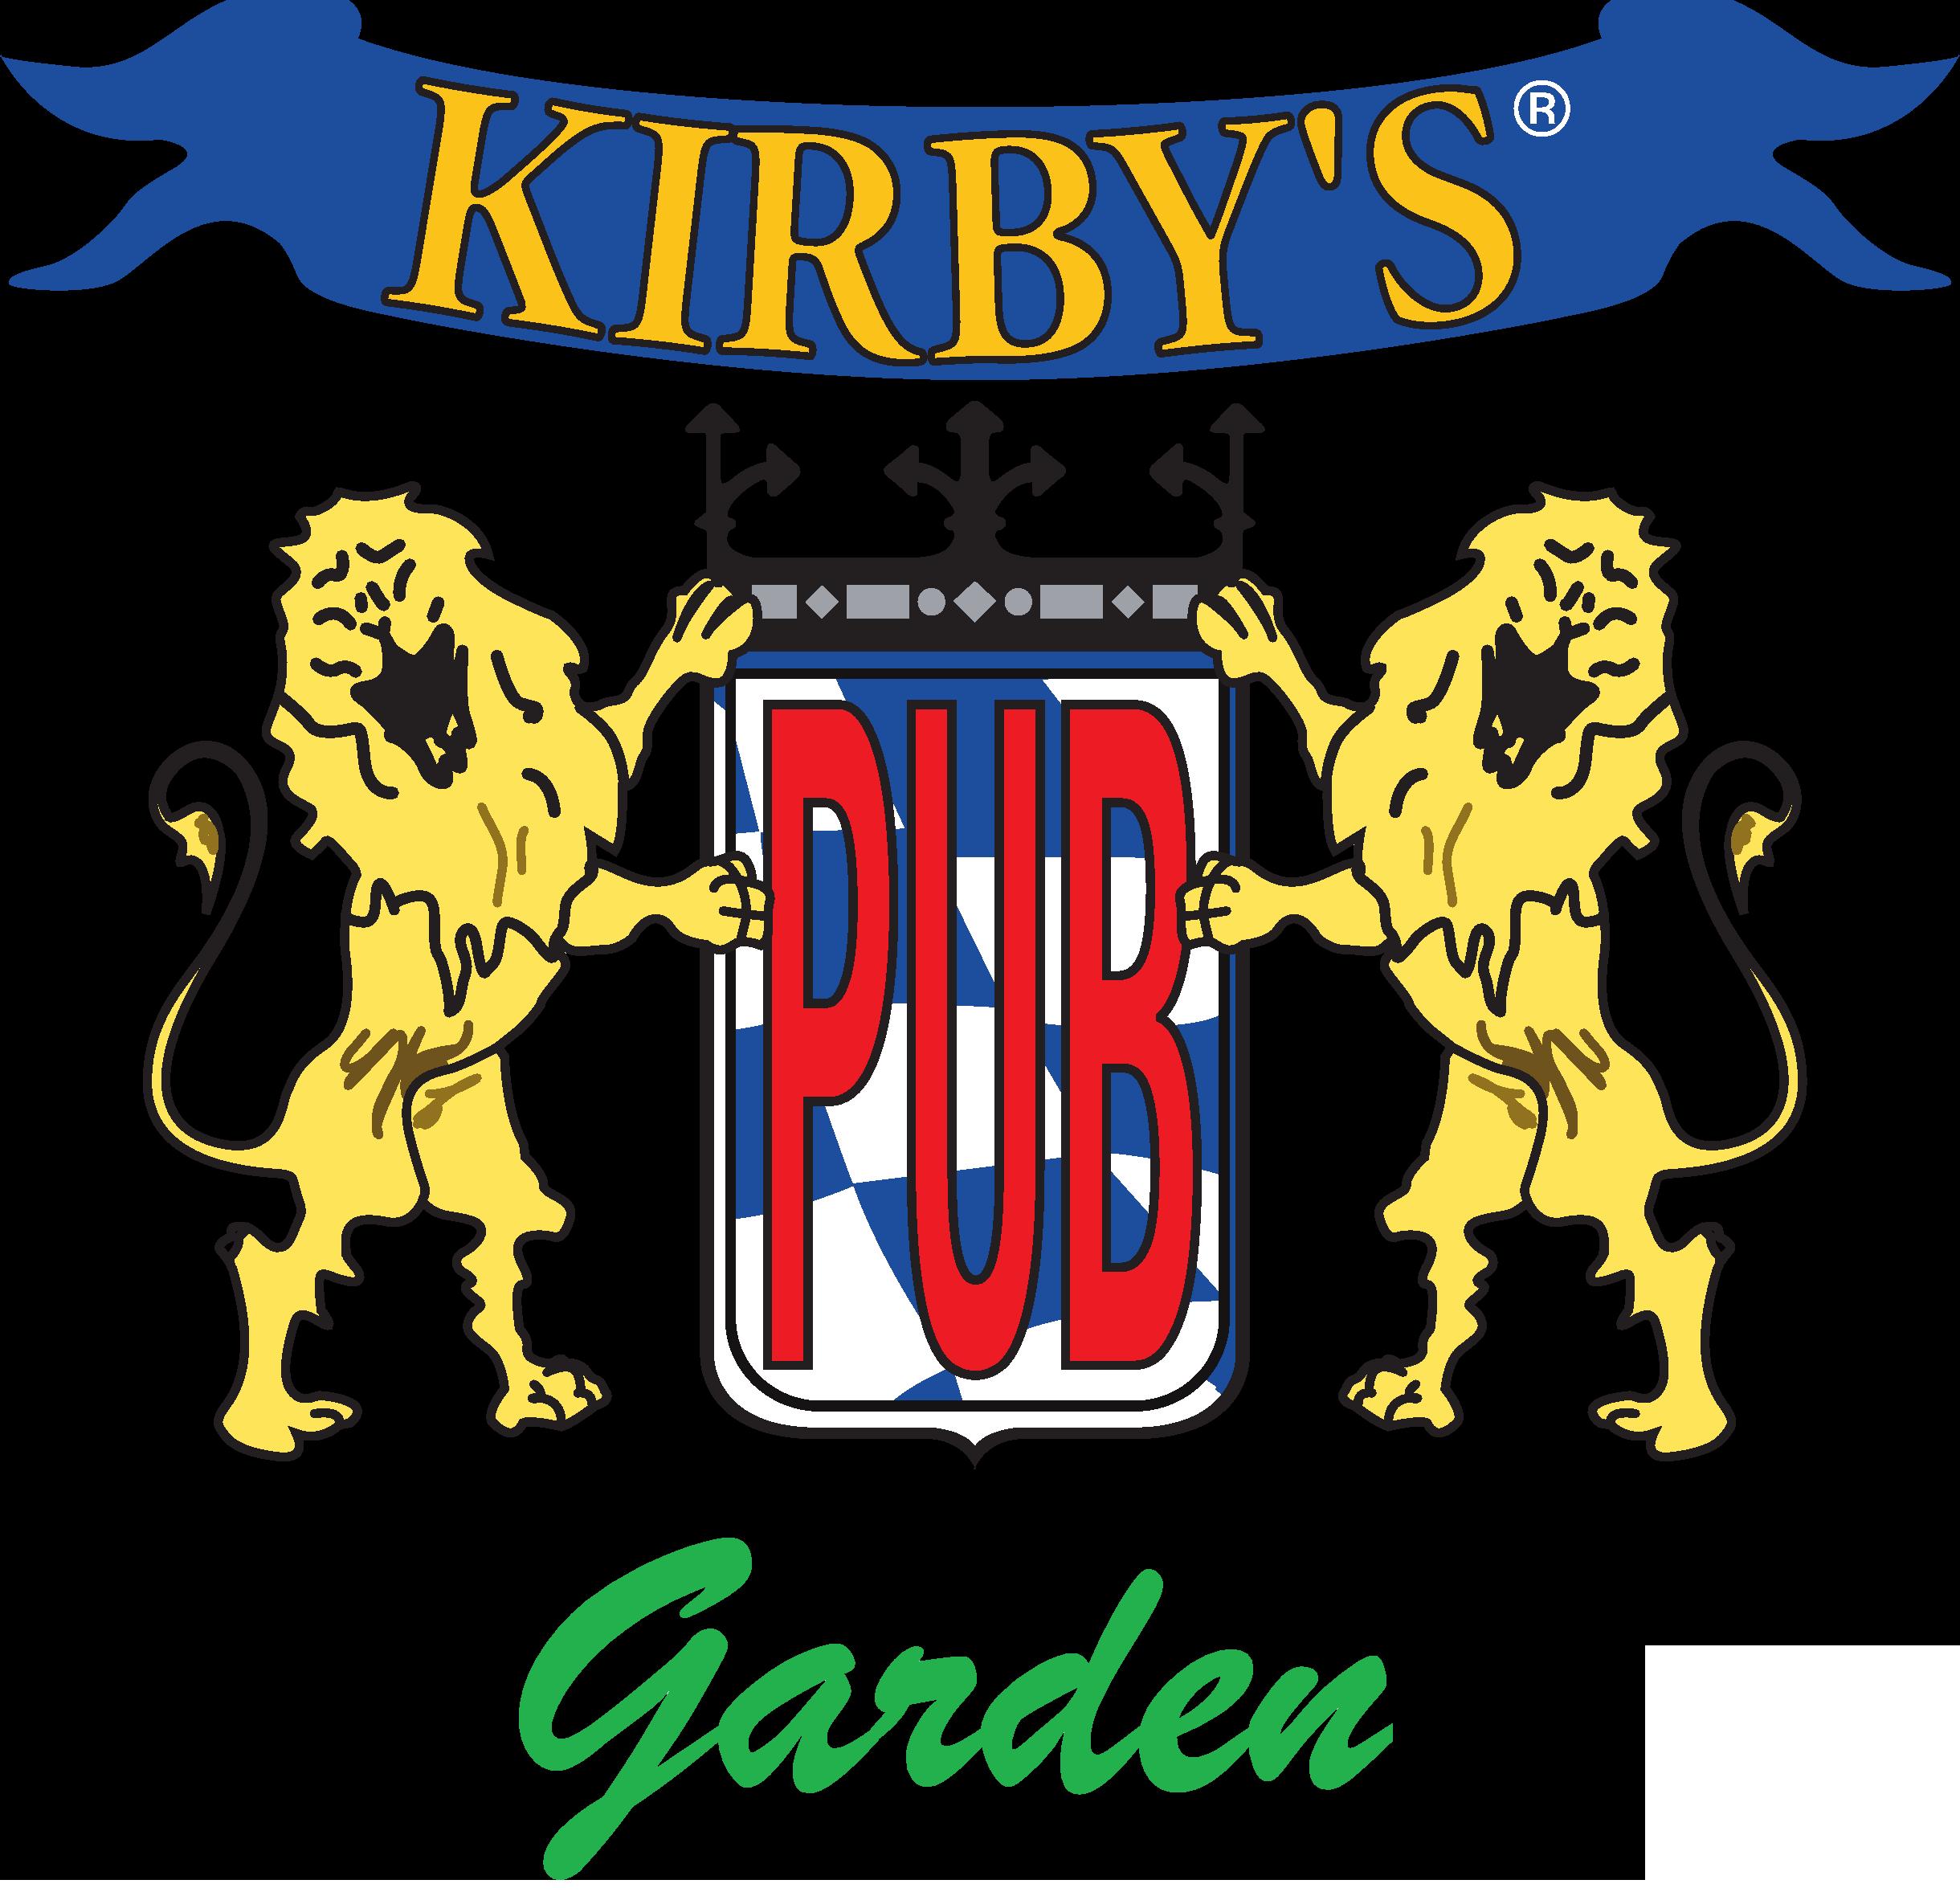 RISTORANTE - KIRBY'S GARDEN